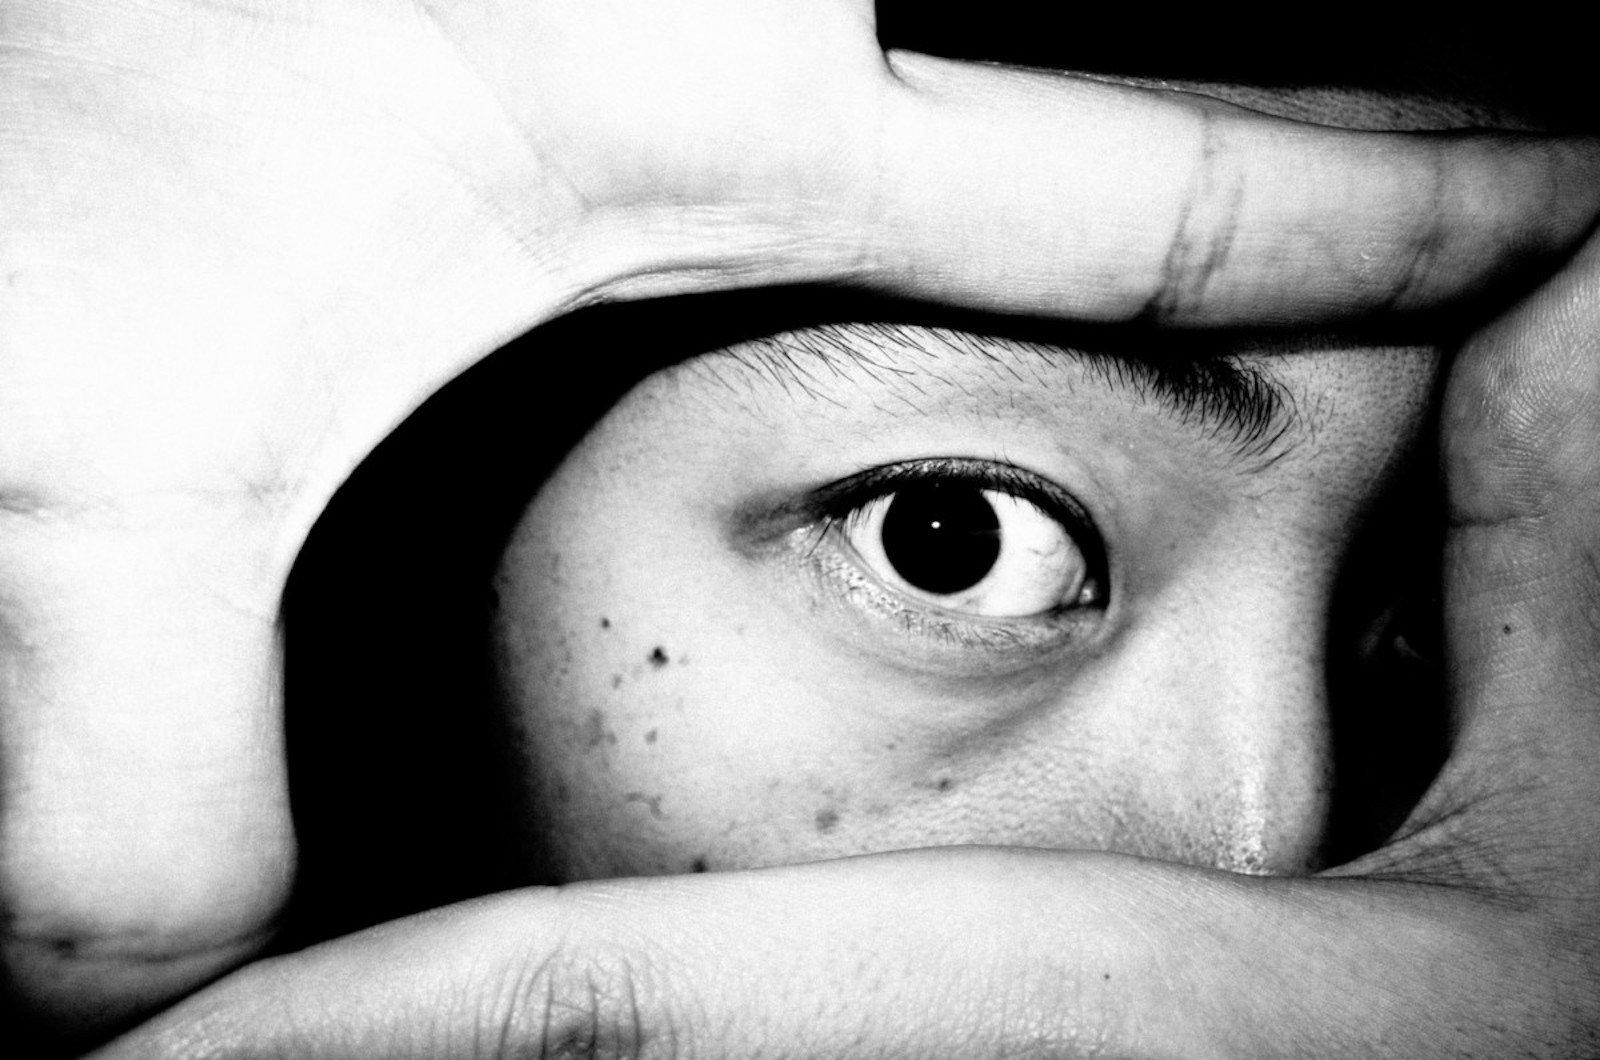 Eric Kim Demuestra el Valor (y la Falacia) de SEO para Fotógrafos - PetaPixel (blog) 1